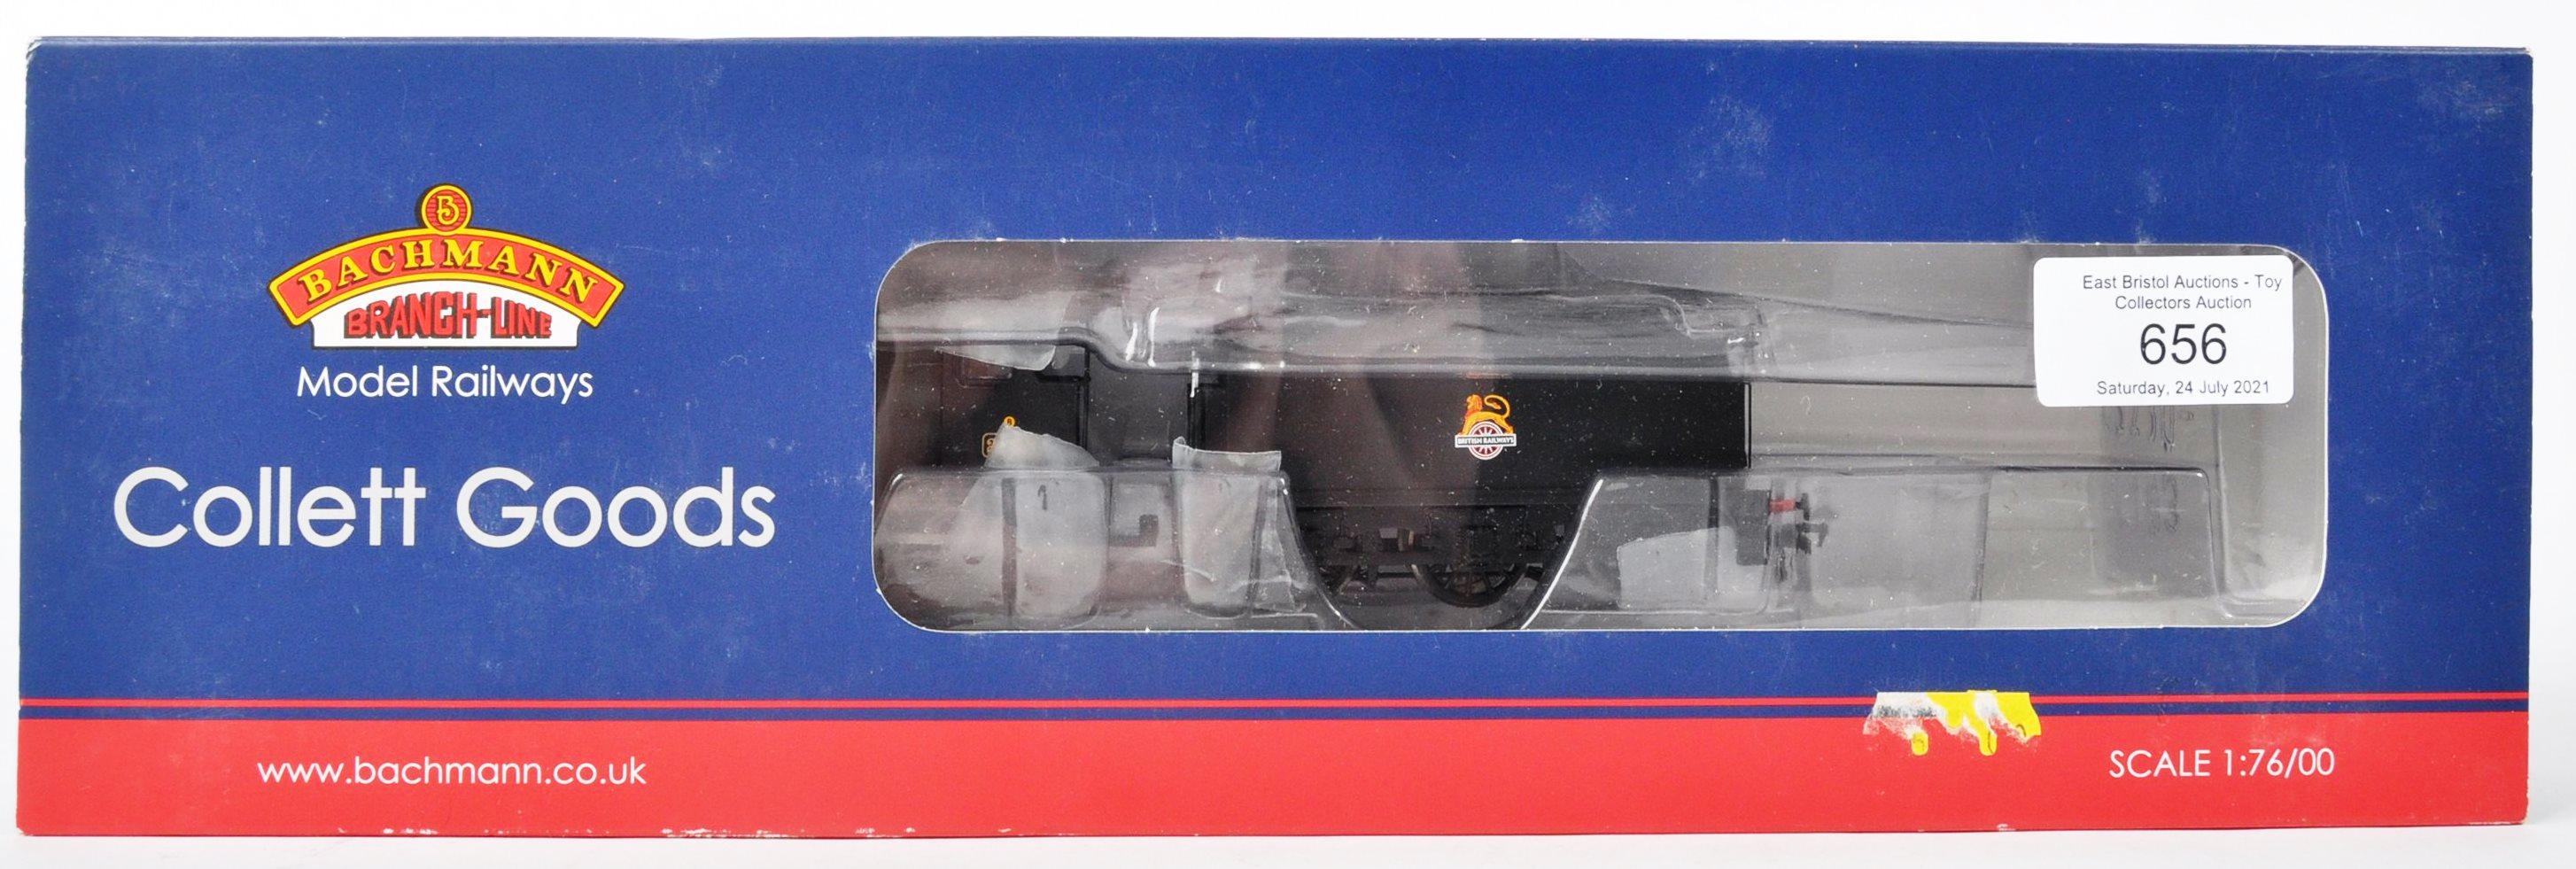 ORIGINAL BACHMANN BRANCH LINE 00 GAUGE MODEL RAILWAY LOCOMOTIVE